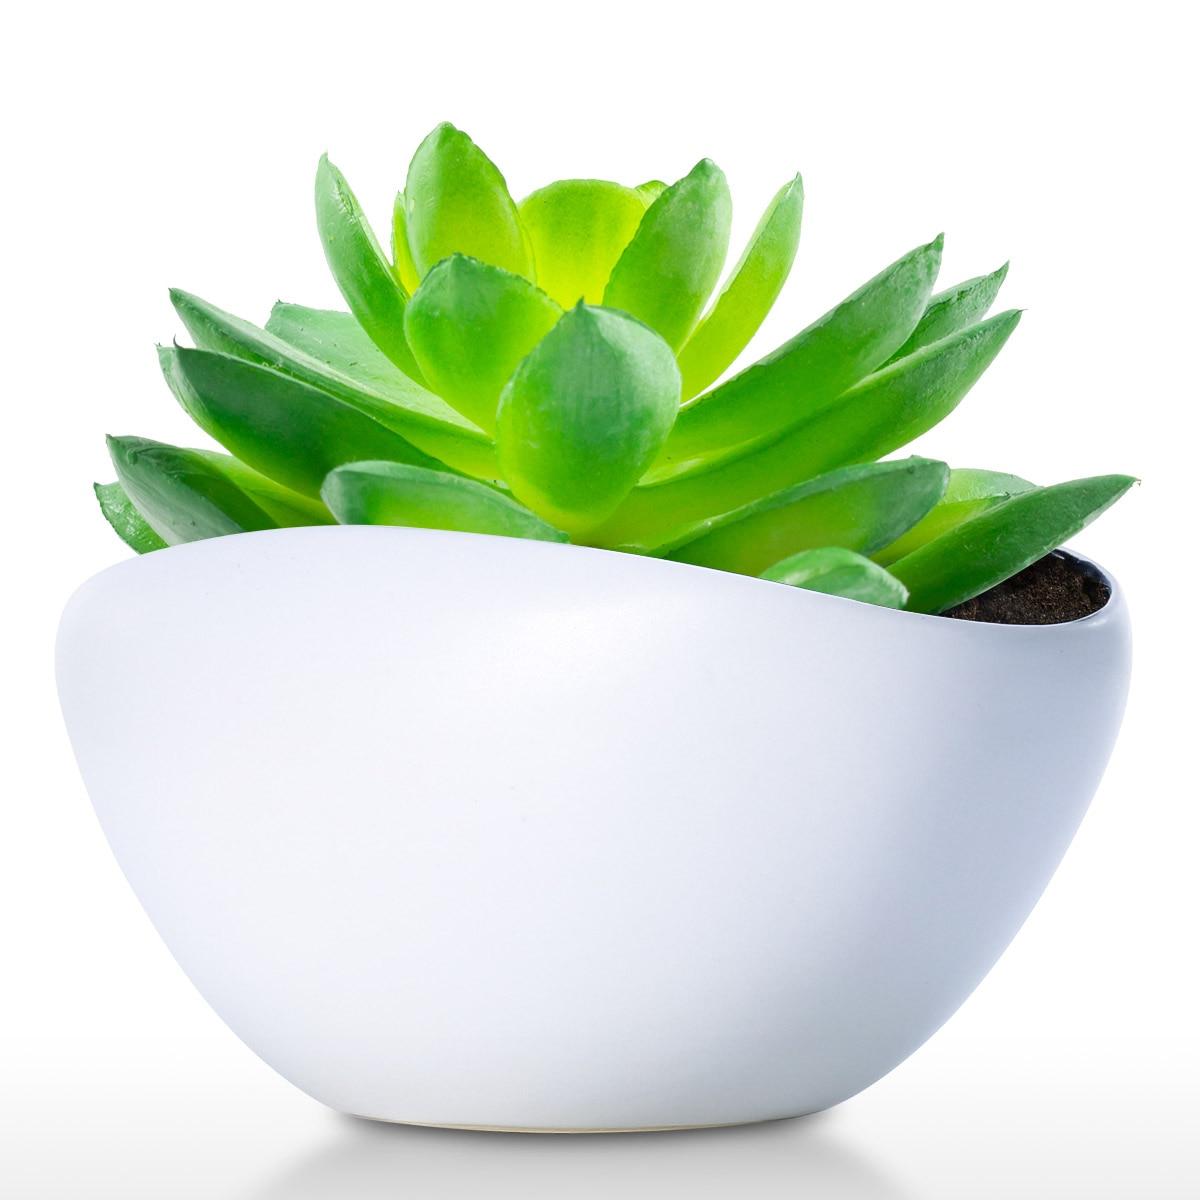 TOOARTS Ceramic Pot Modern Planter Pot Decor for Home Office Weddings Parties Tabletop Centerpiece Flower Pot